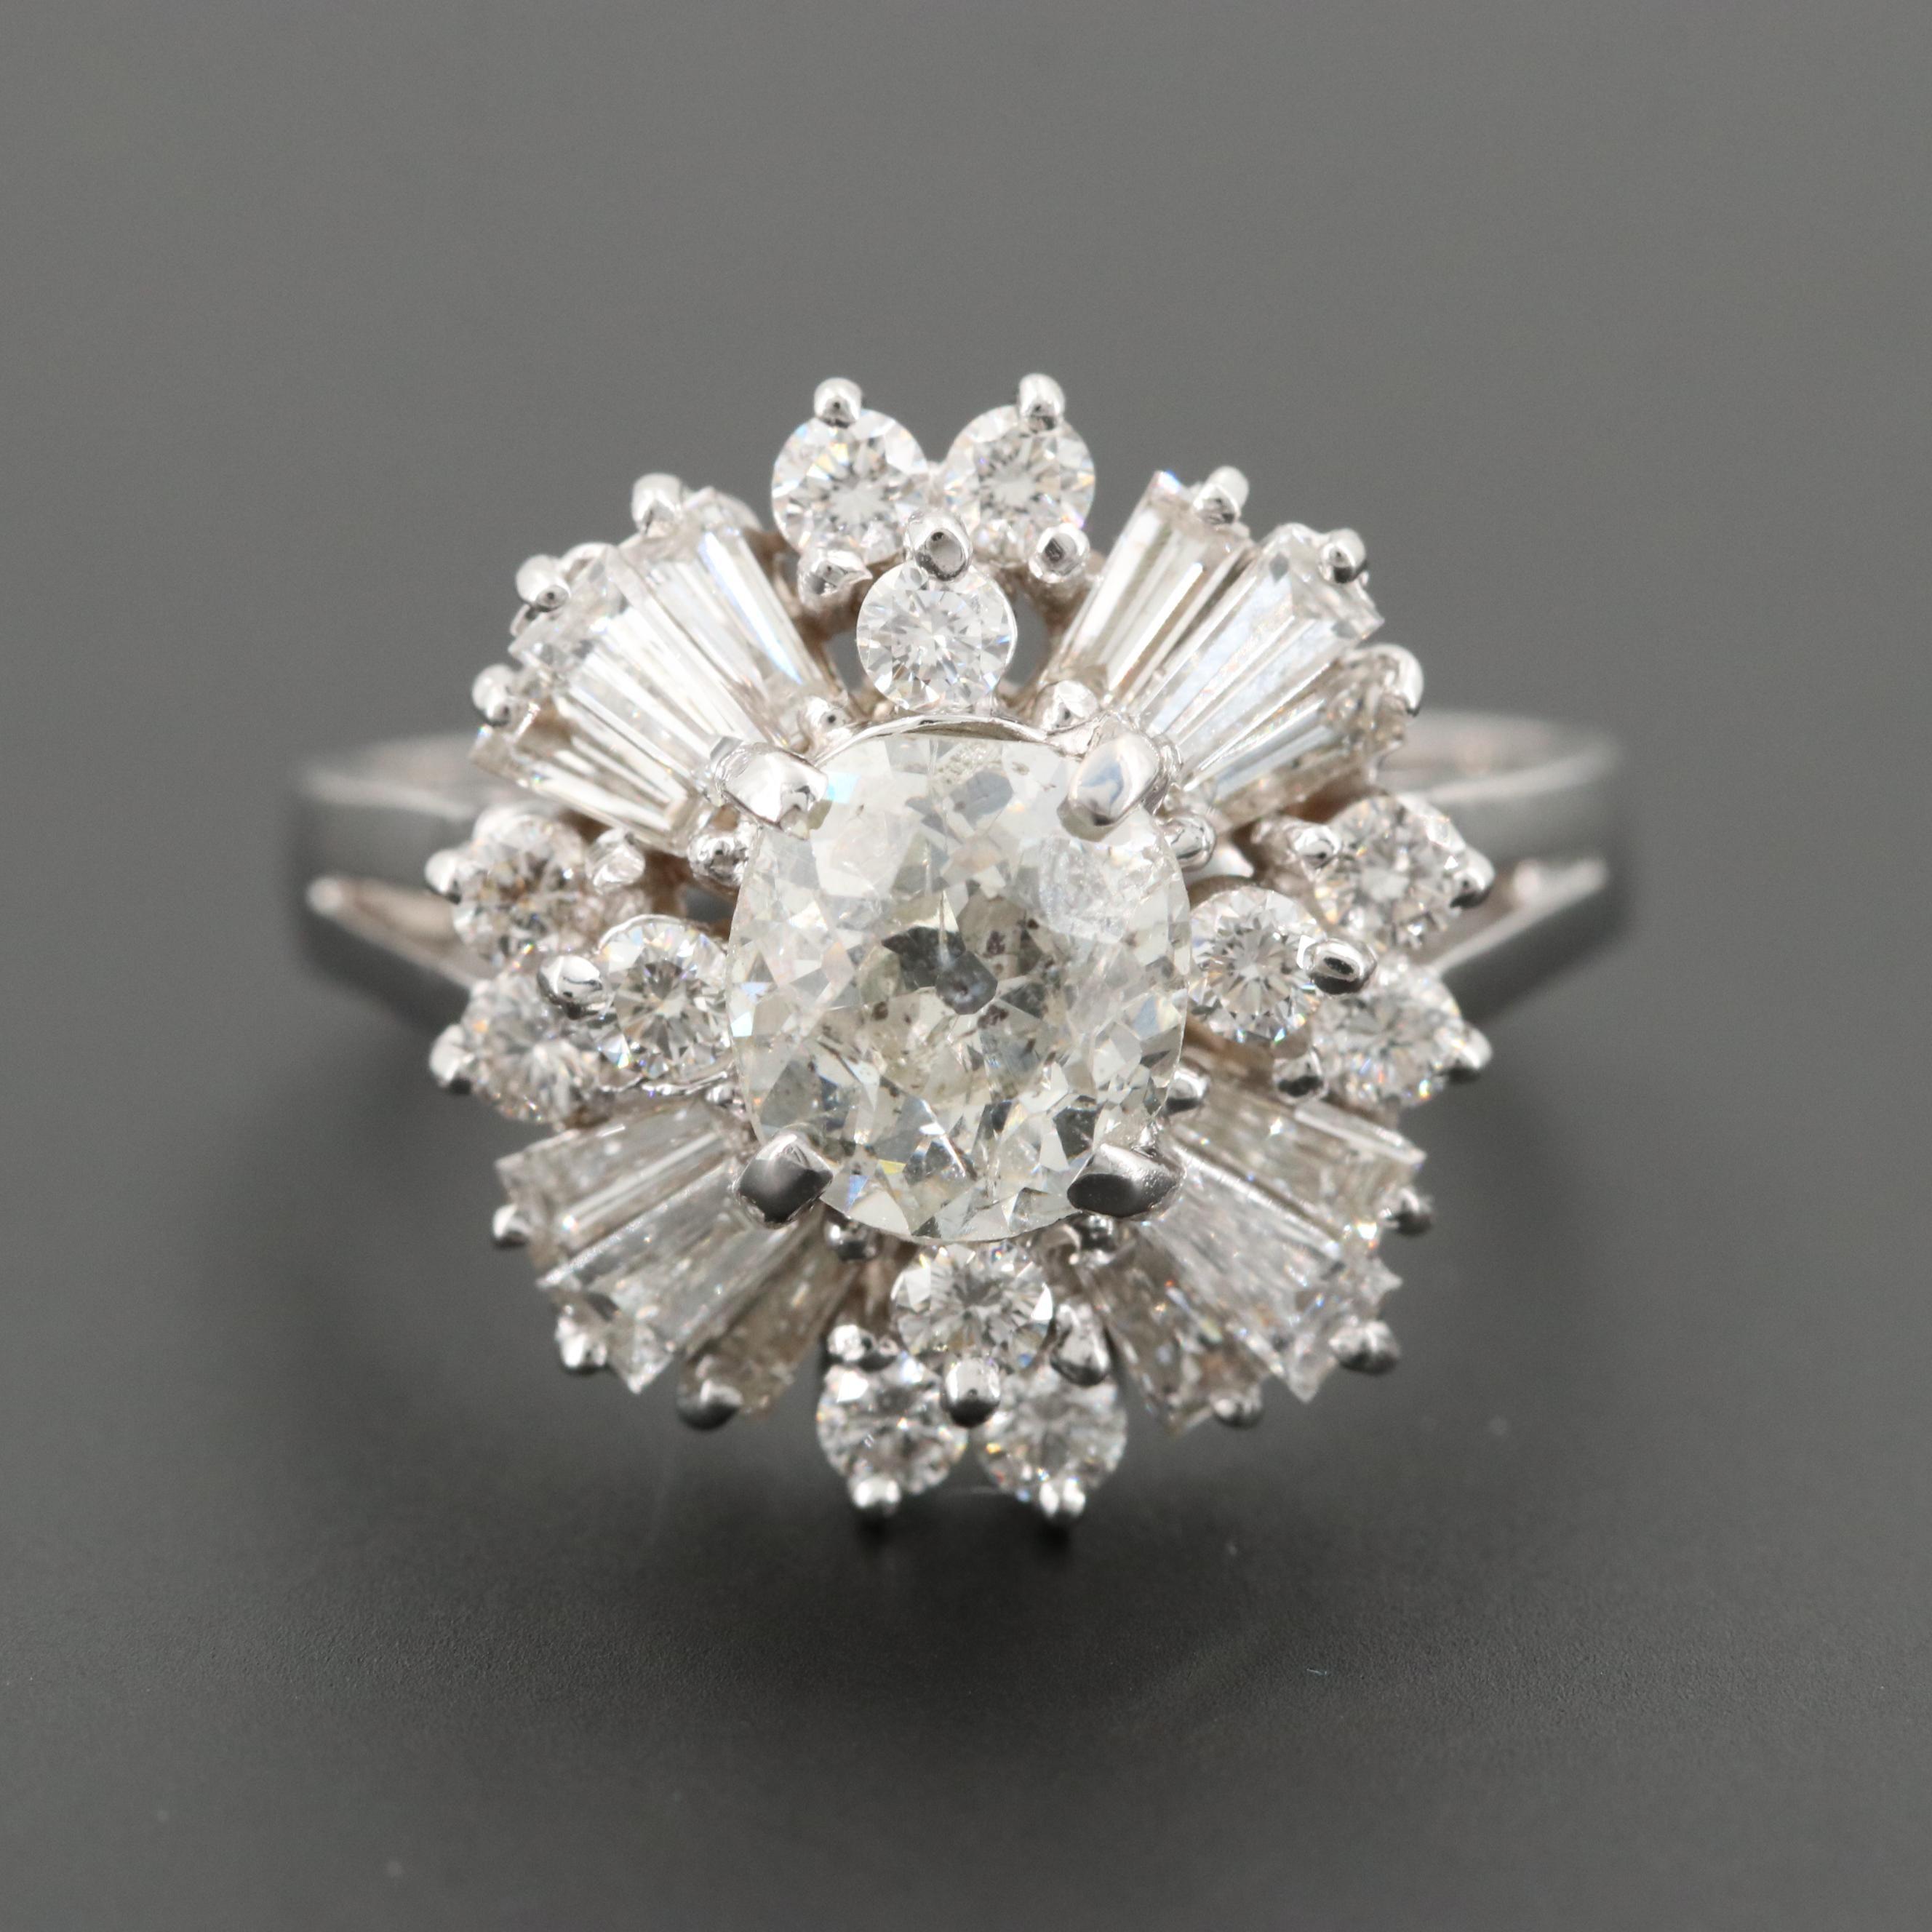 18K White Gold 2.95 CTW Diamond Ring